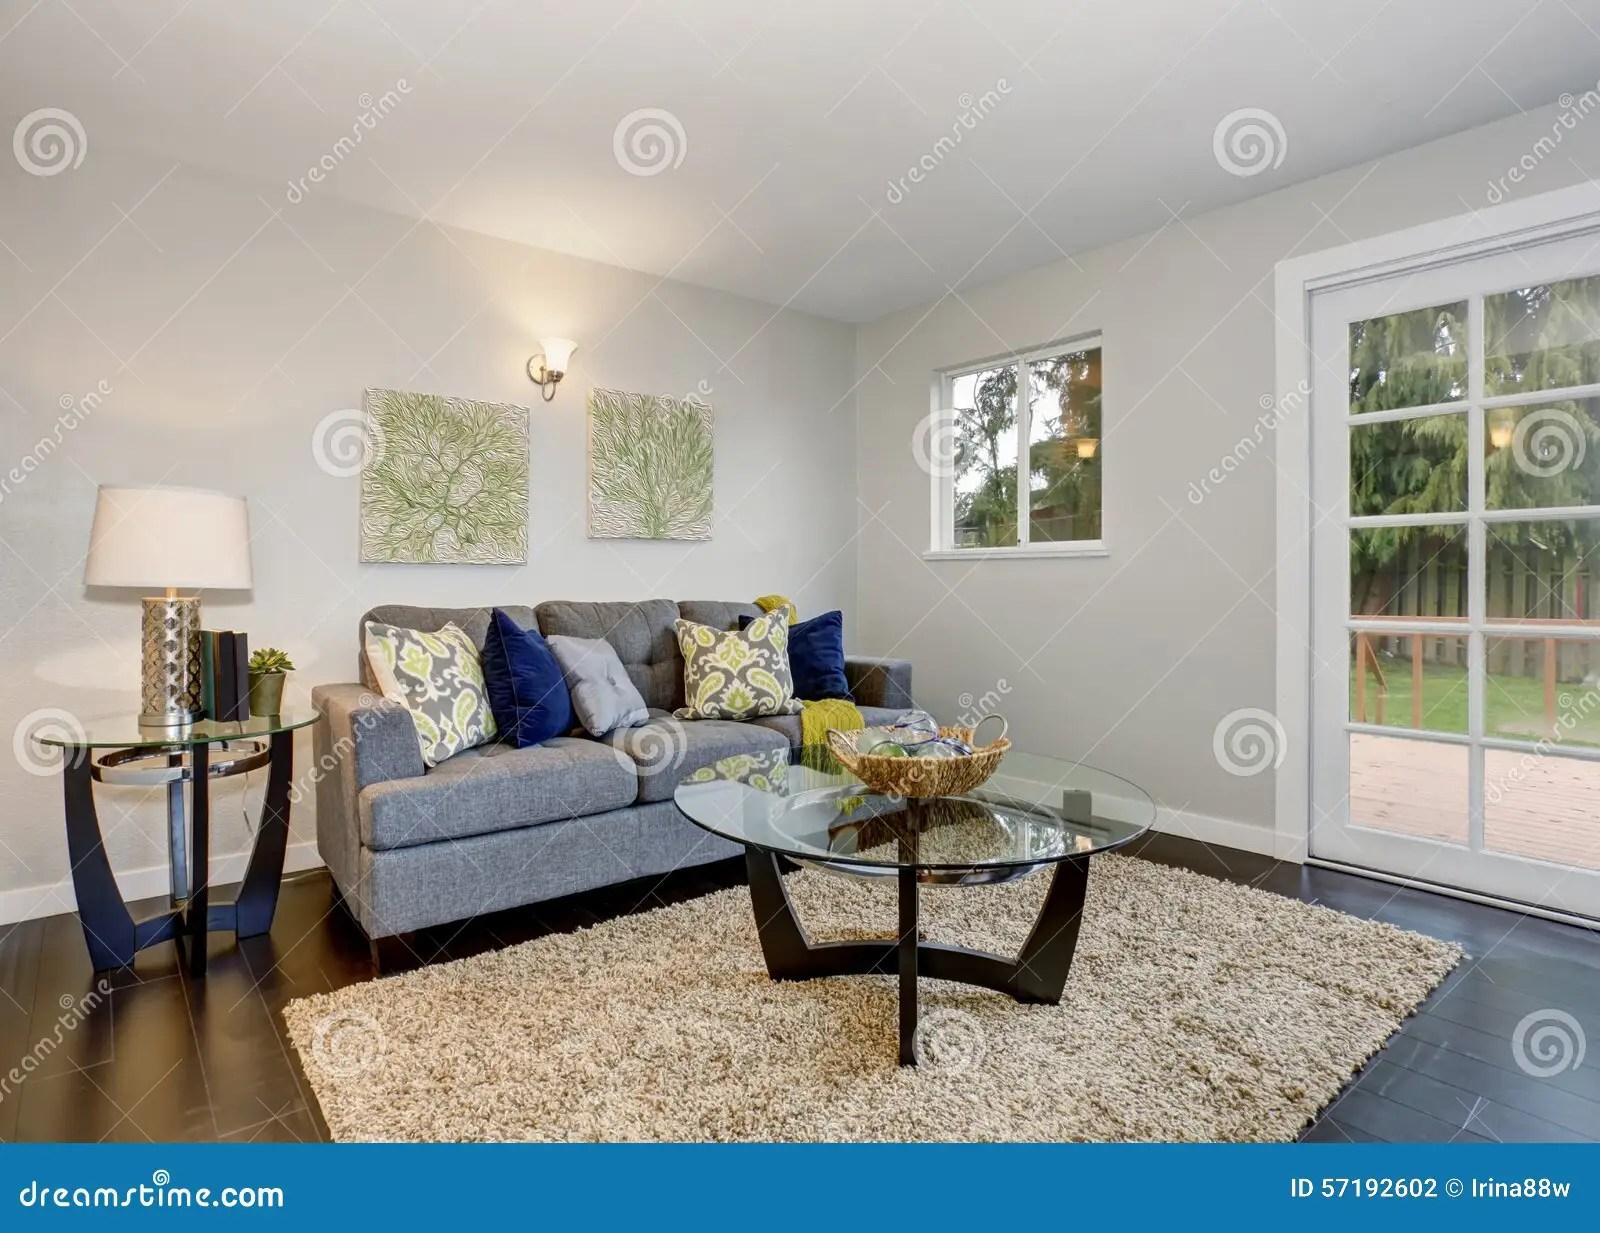 cute kitchen rugs refurbished appliances 有蓝色沙发的可爱的室库存照片 图片包括有厨房 豪华 楼层 庄园 拱道 可爱的室在有蓝色沙发和硬木地板的现代家